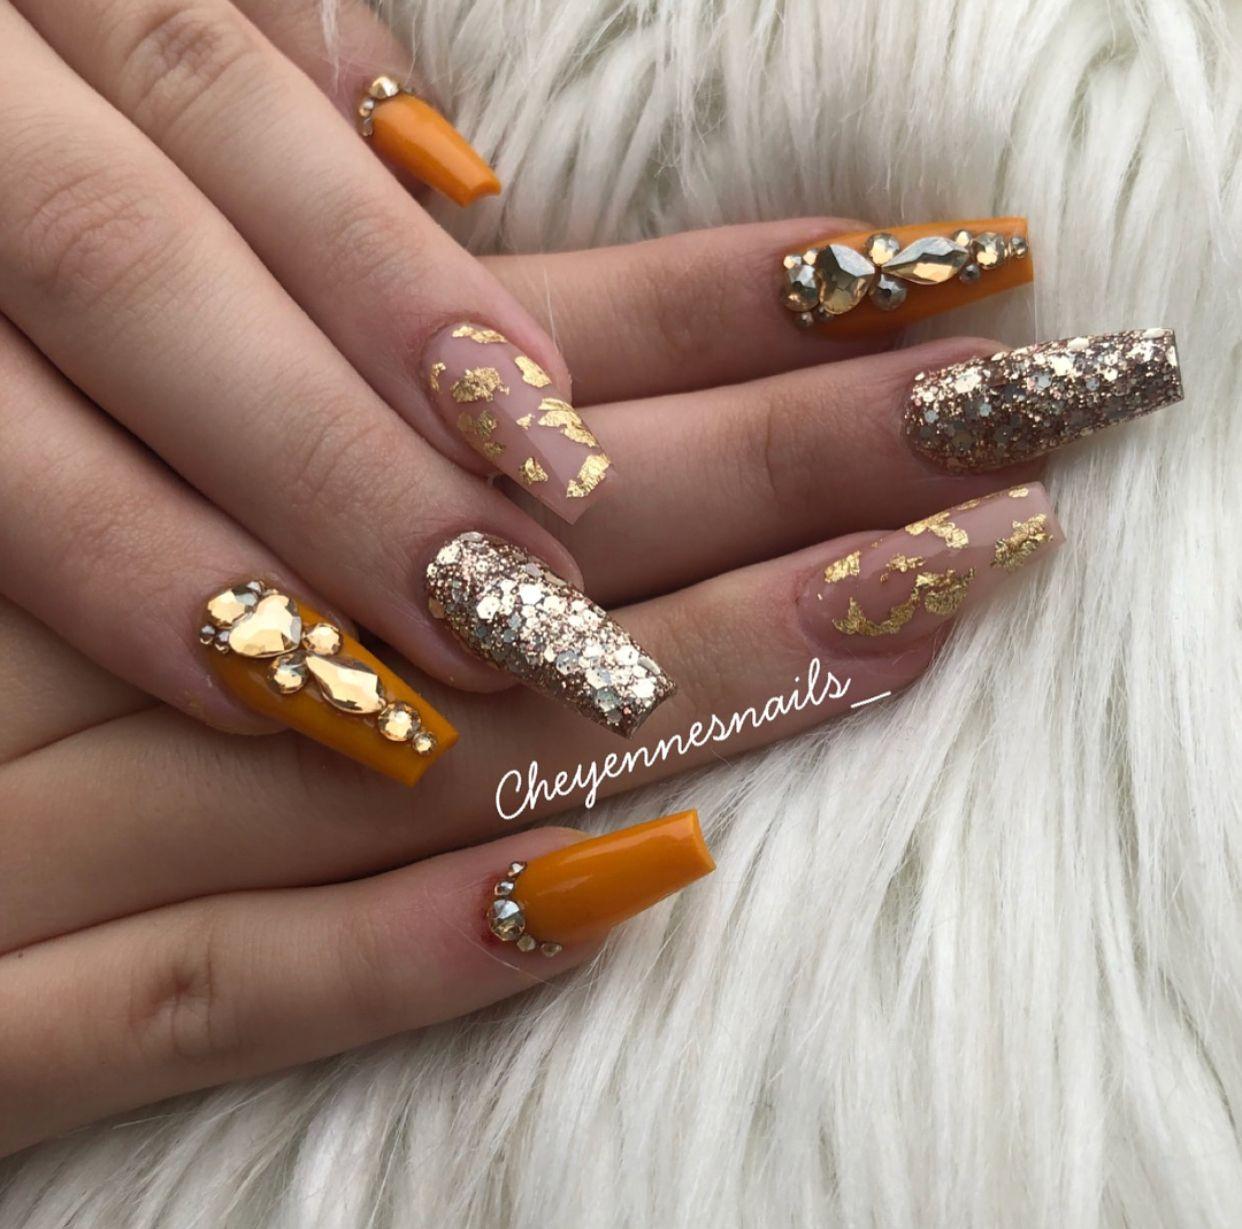 Pinterest Itsmealicea Fall Acrylic Nails Metallic Nails Design Nails